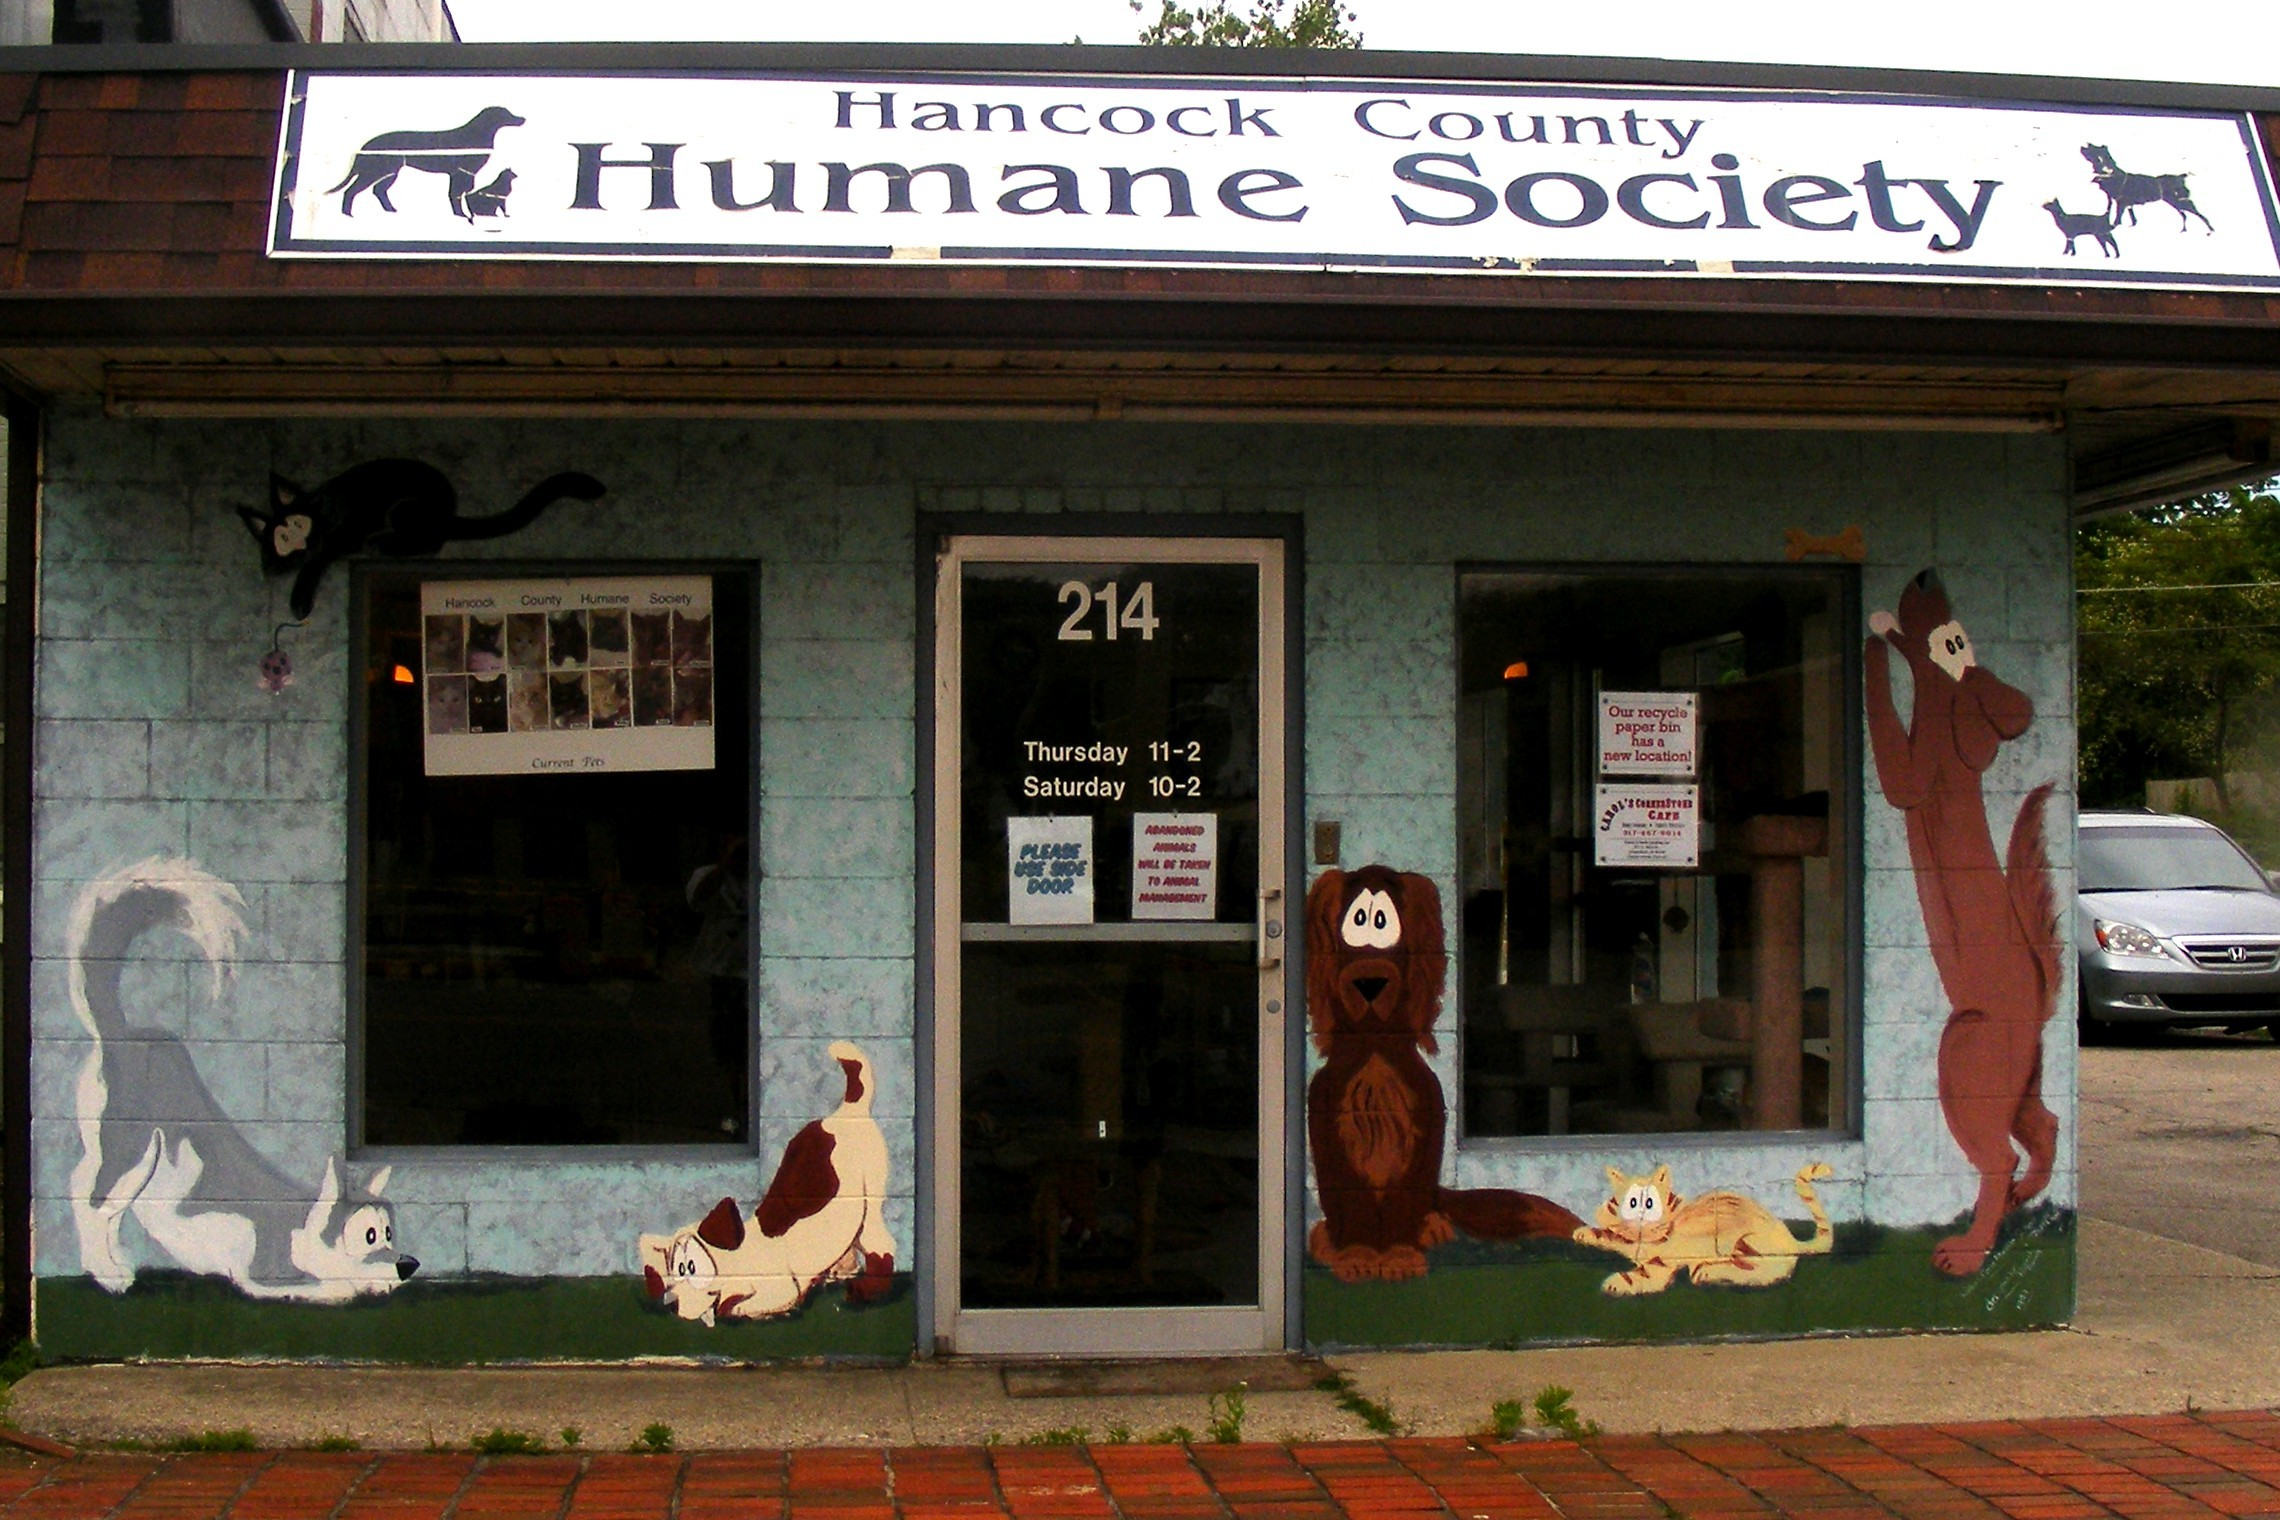 Hancock County Humane Society